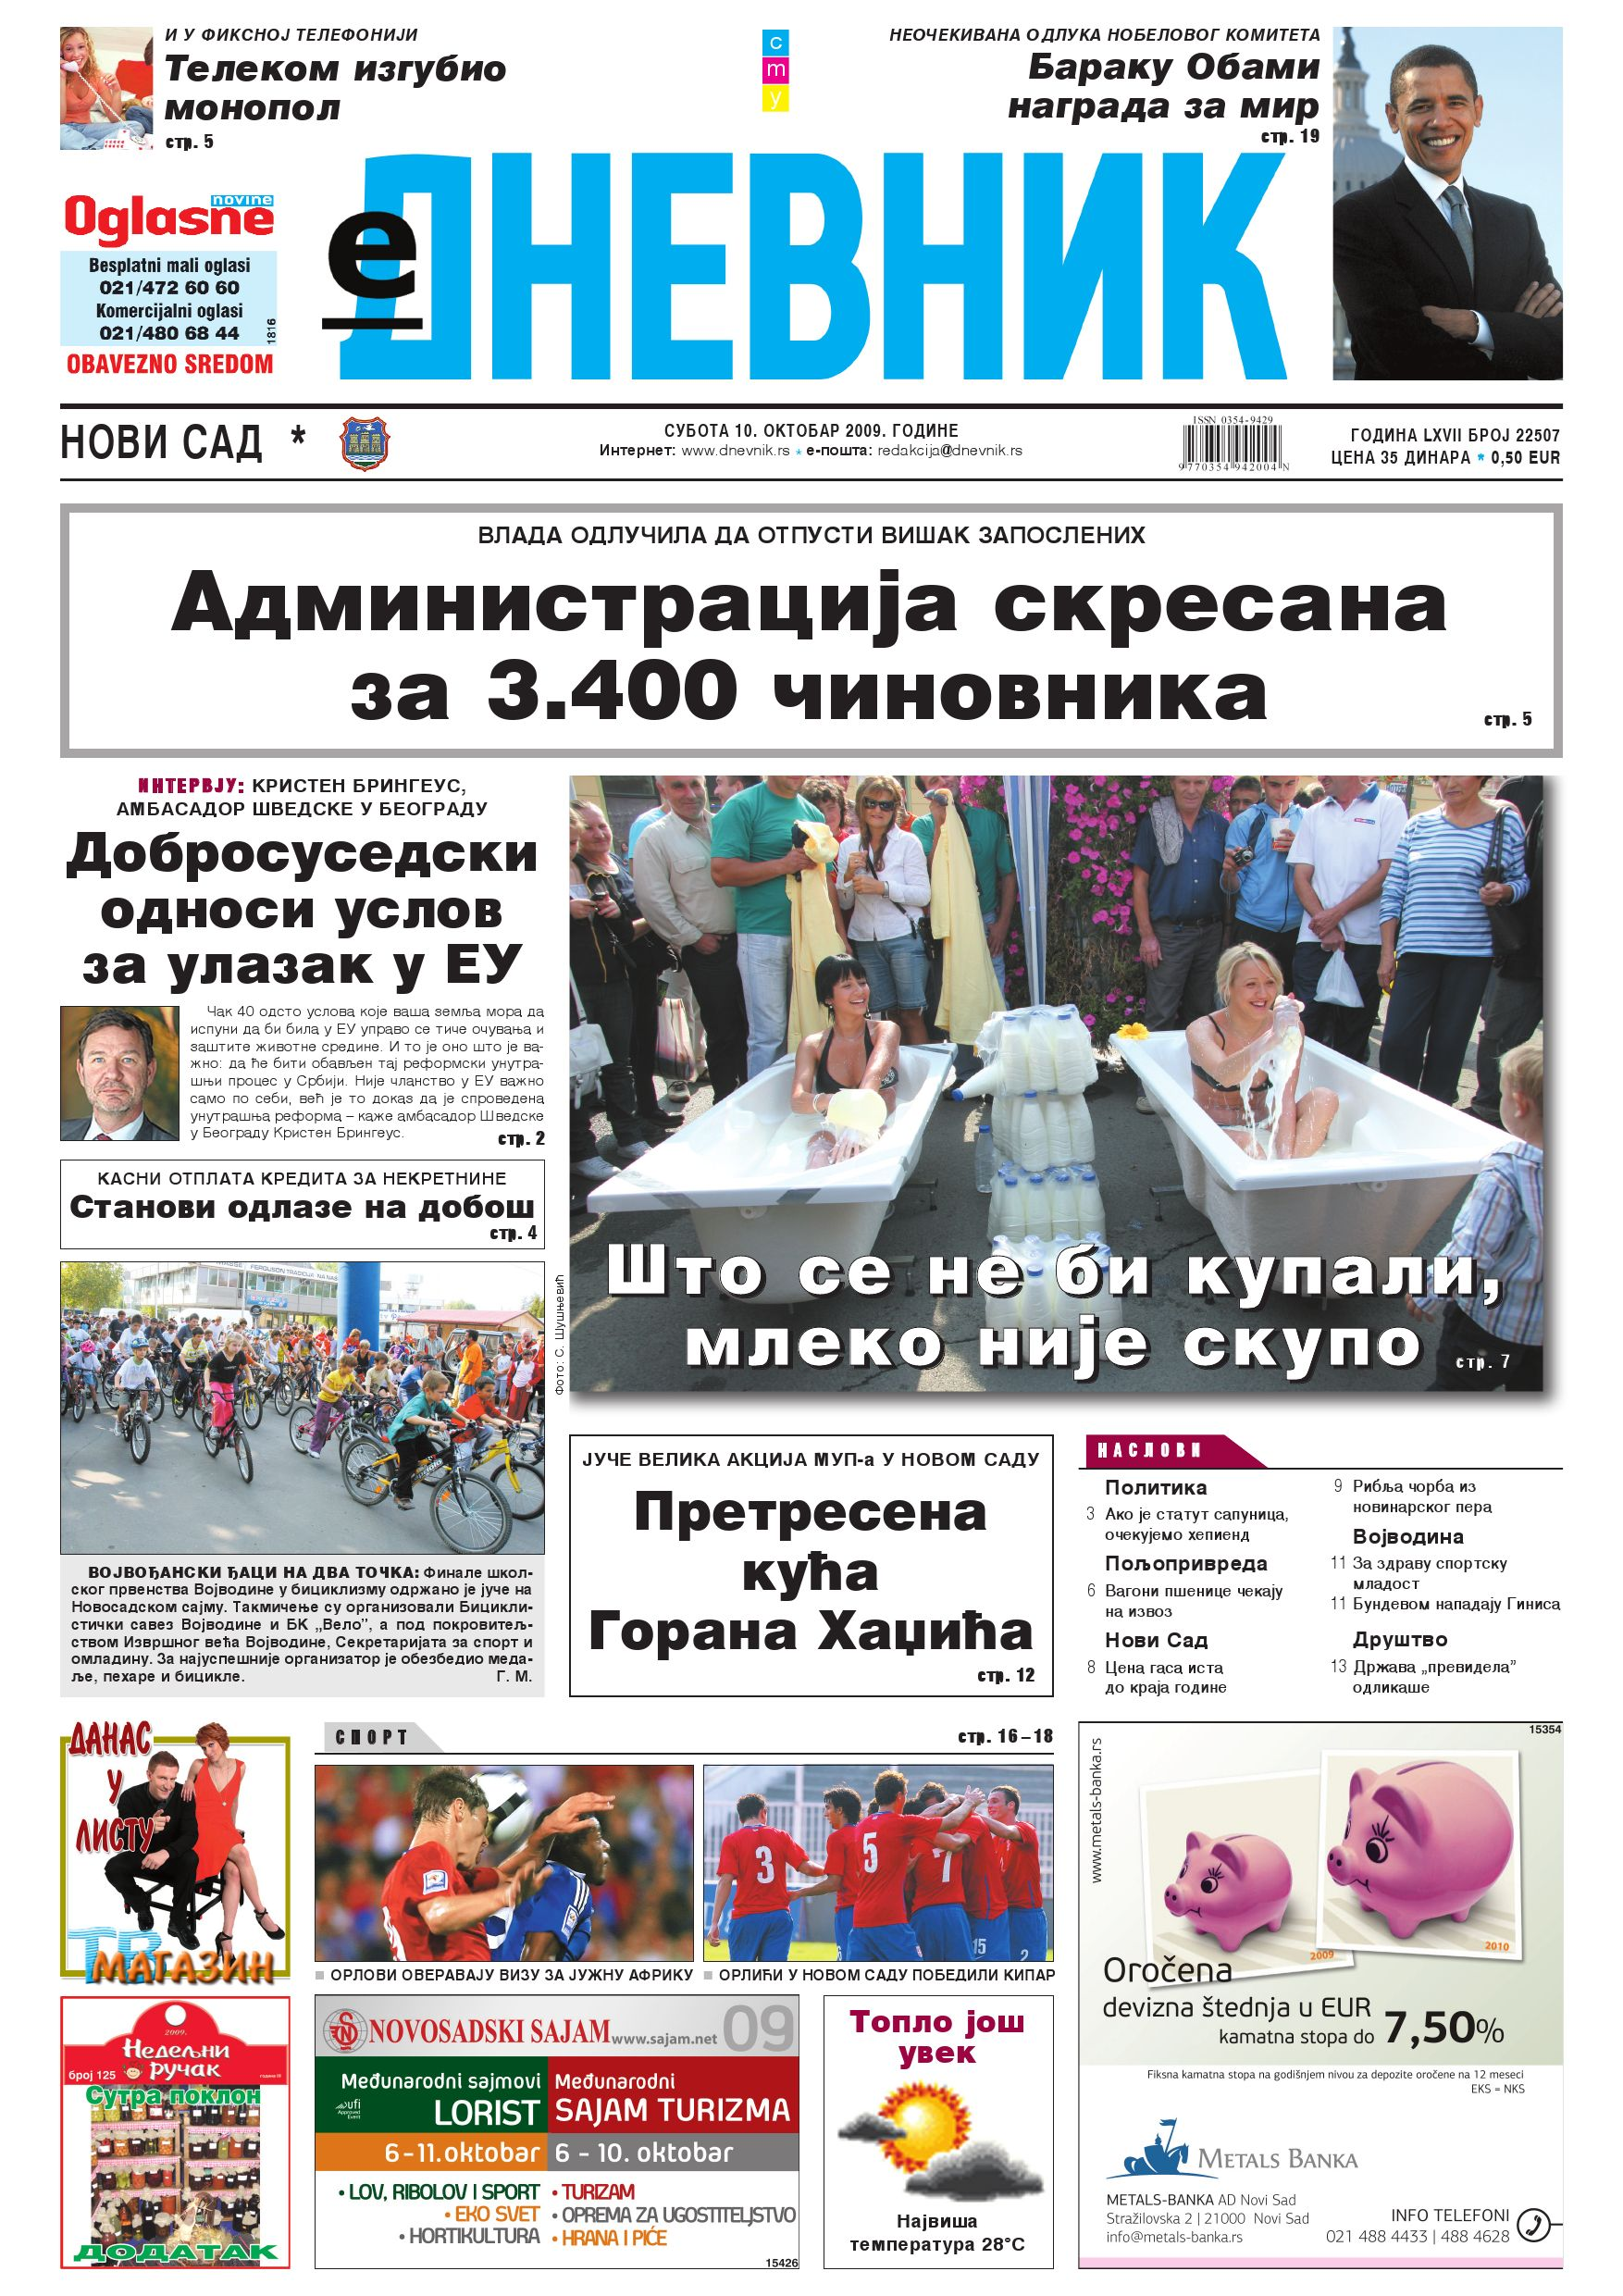 Dnevnik 10 oktobar 2009  by jovan radosavljevic - issuu